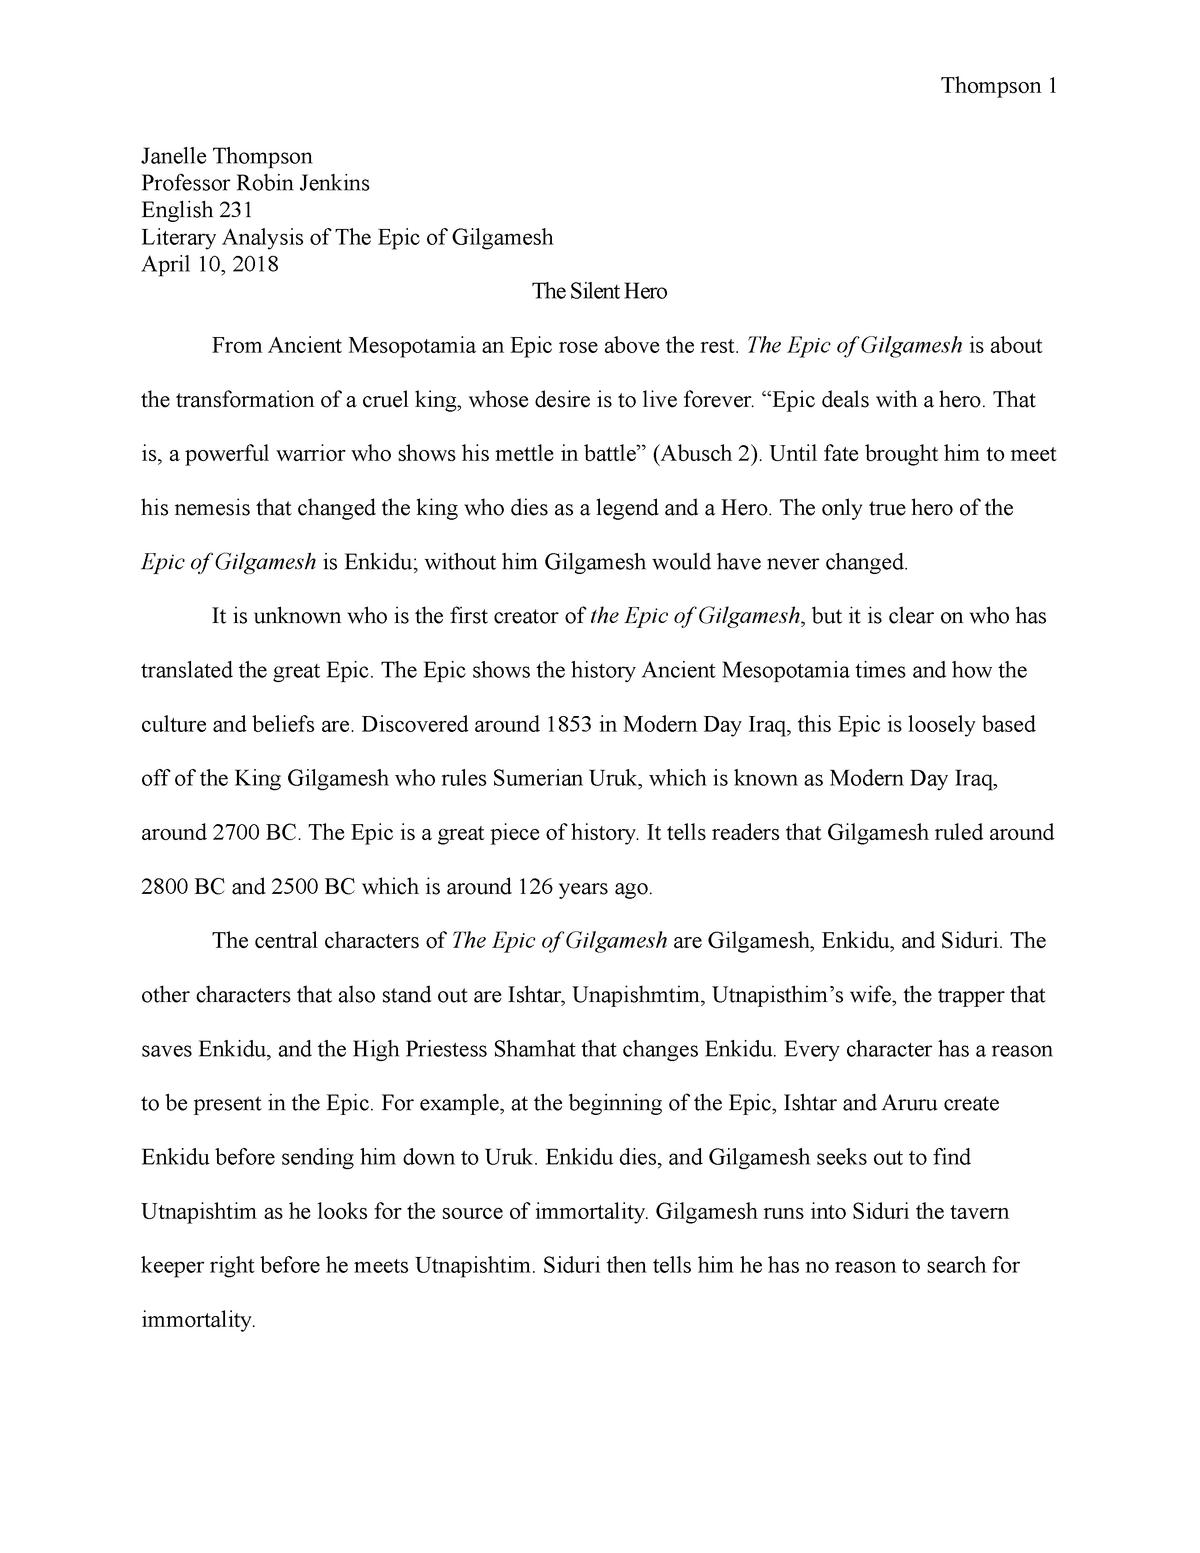 literary analysis comparision of gilgamesh and enkidu   eng   literary analysis comparision of gilgamesh and enkidu   eng  world  literature i   studocu